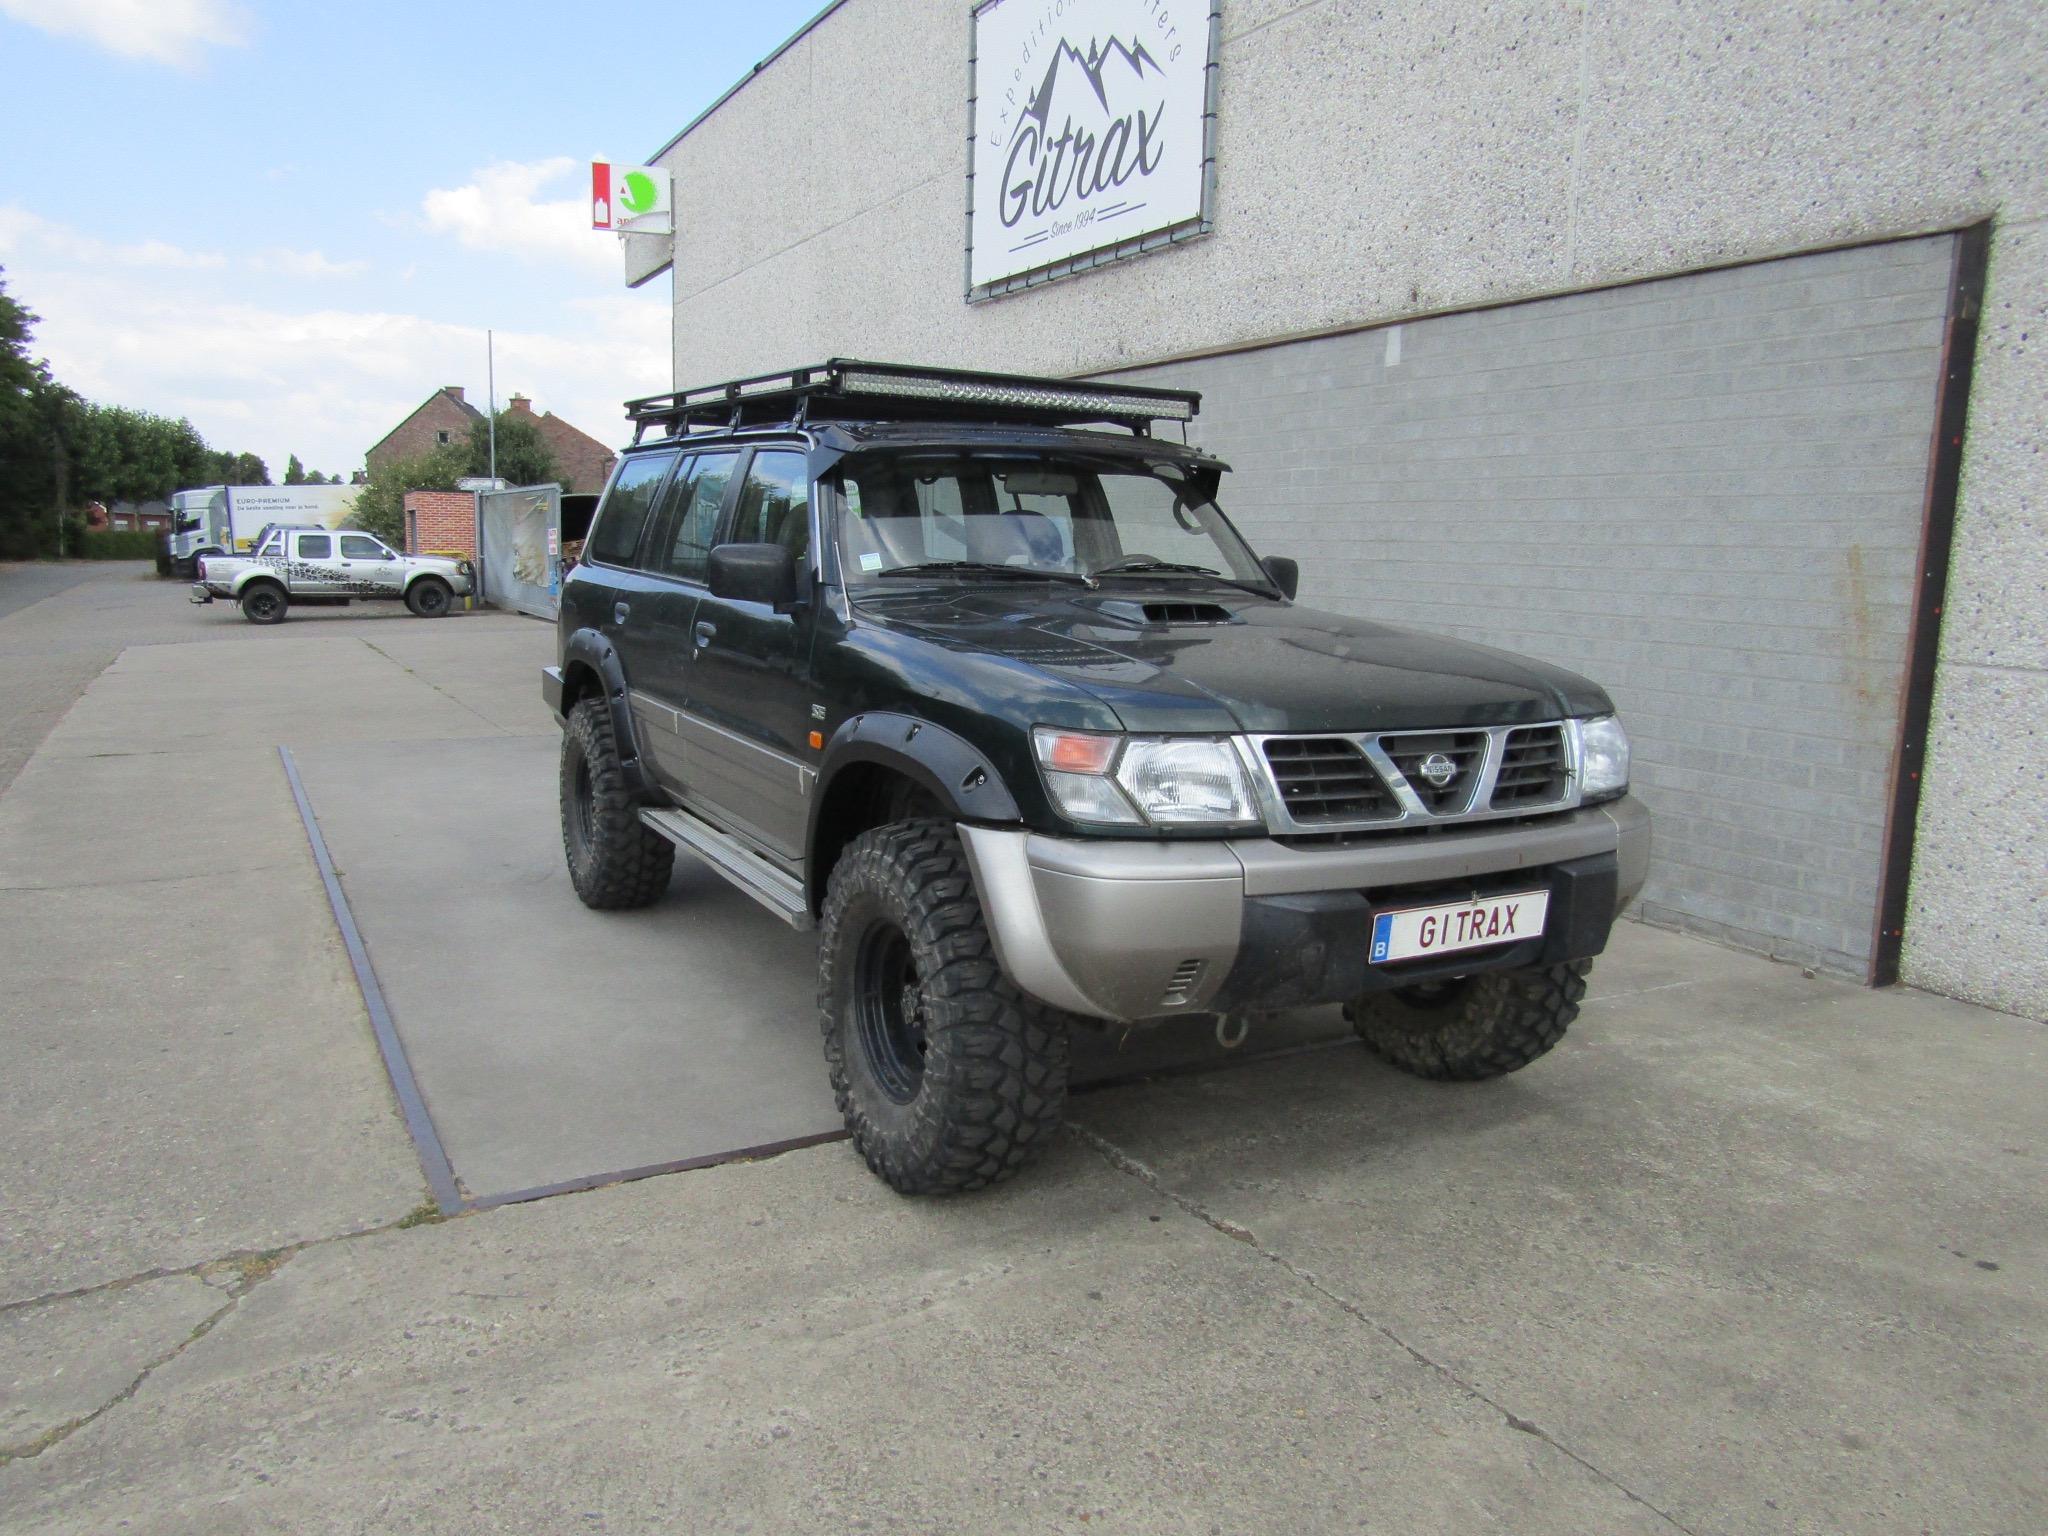 Nissan Patrol Gitrax